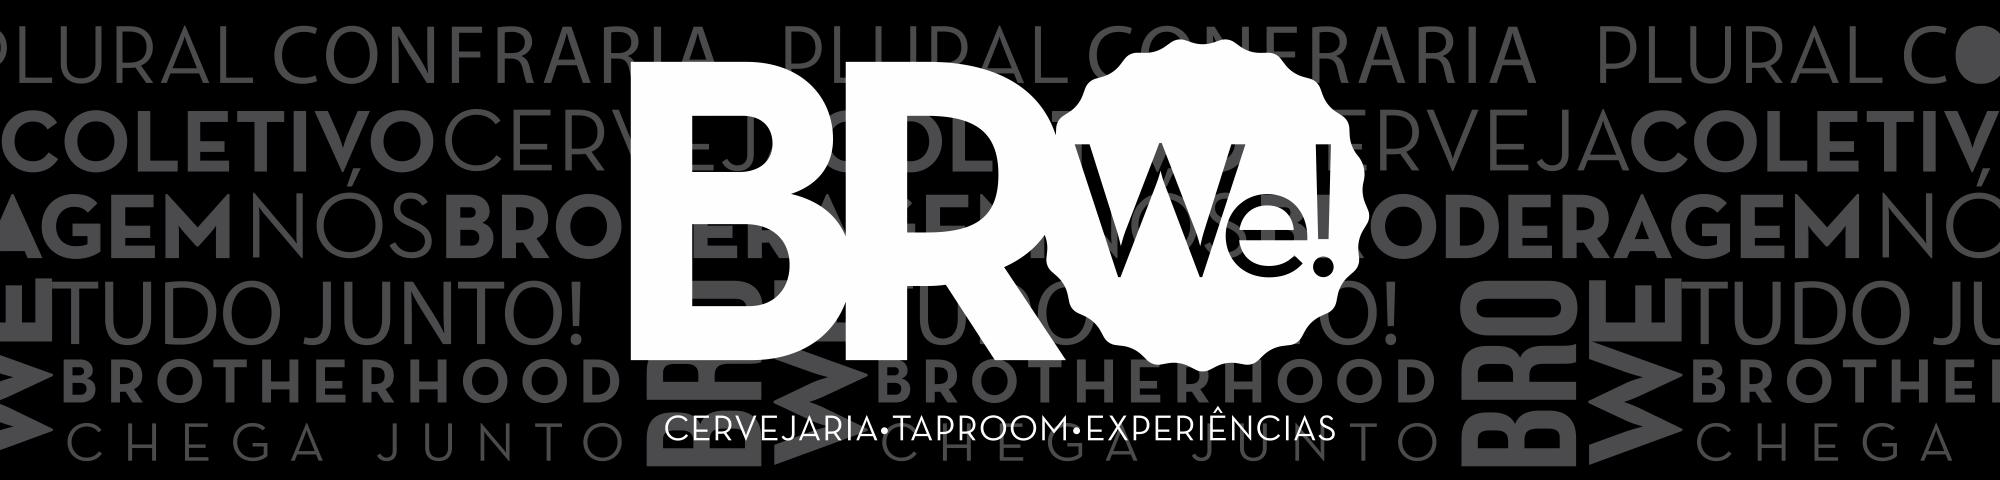 Cervejaria BROWe